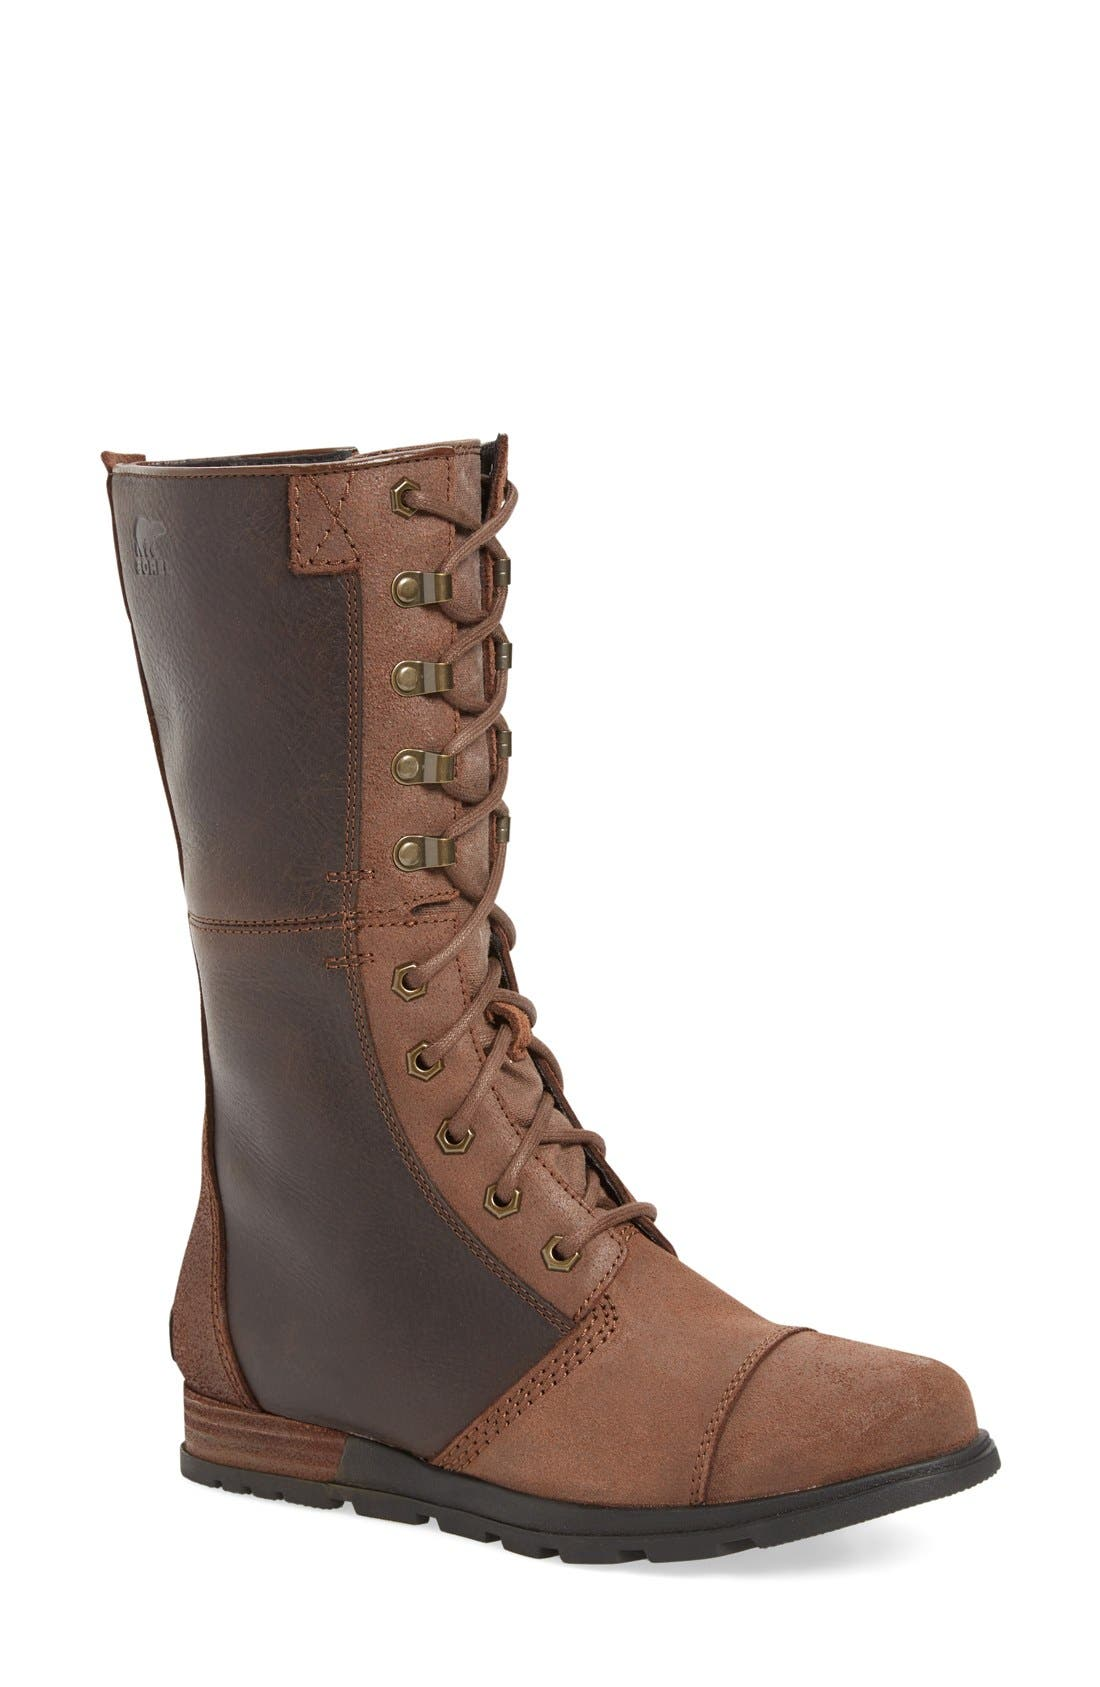 Alternate Image 1 Selected - SOREL 'Major Maverick' Mid Calf Zip Boot (Women)